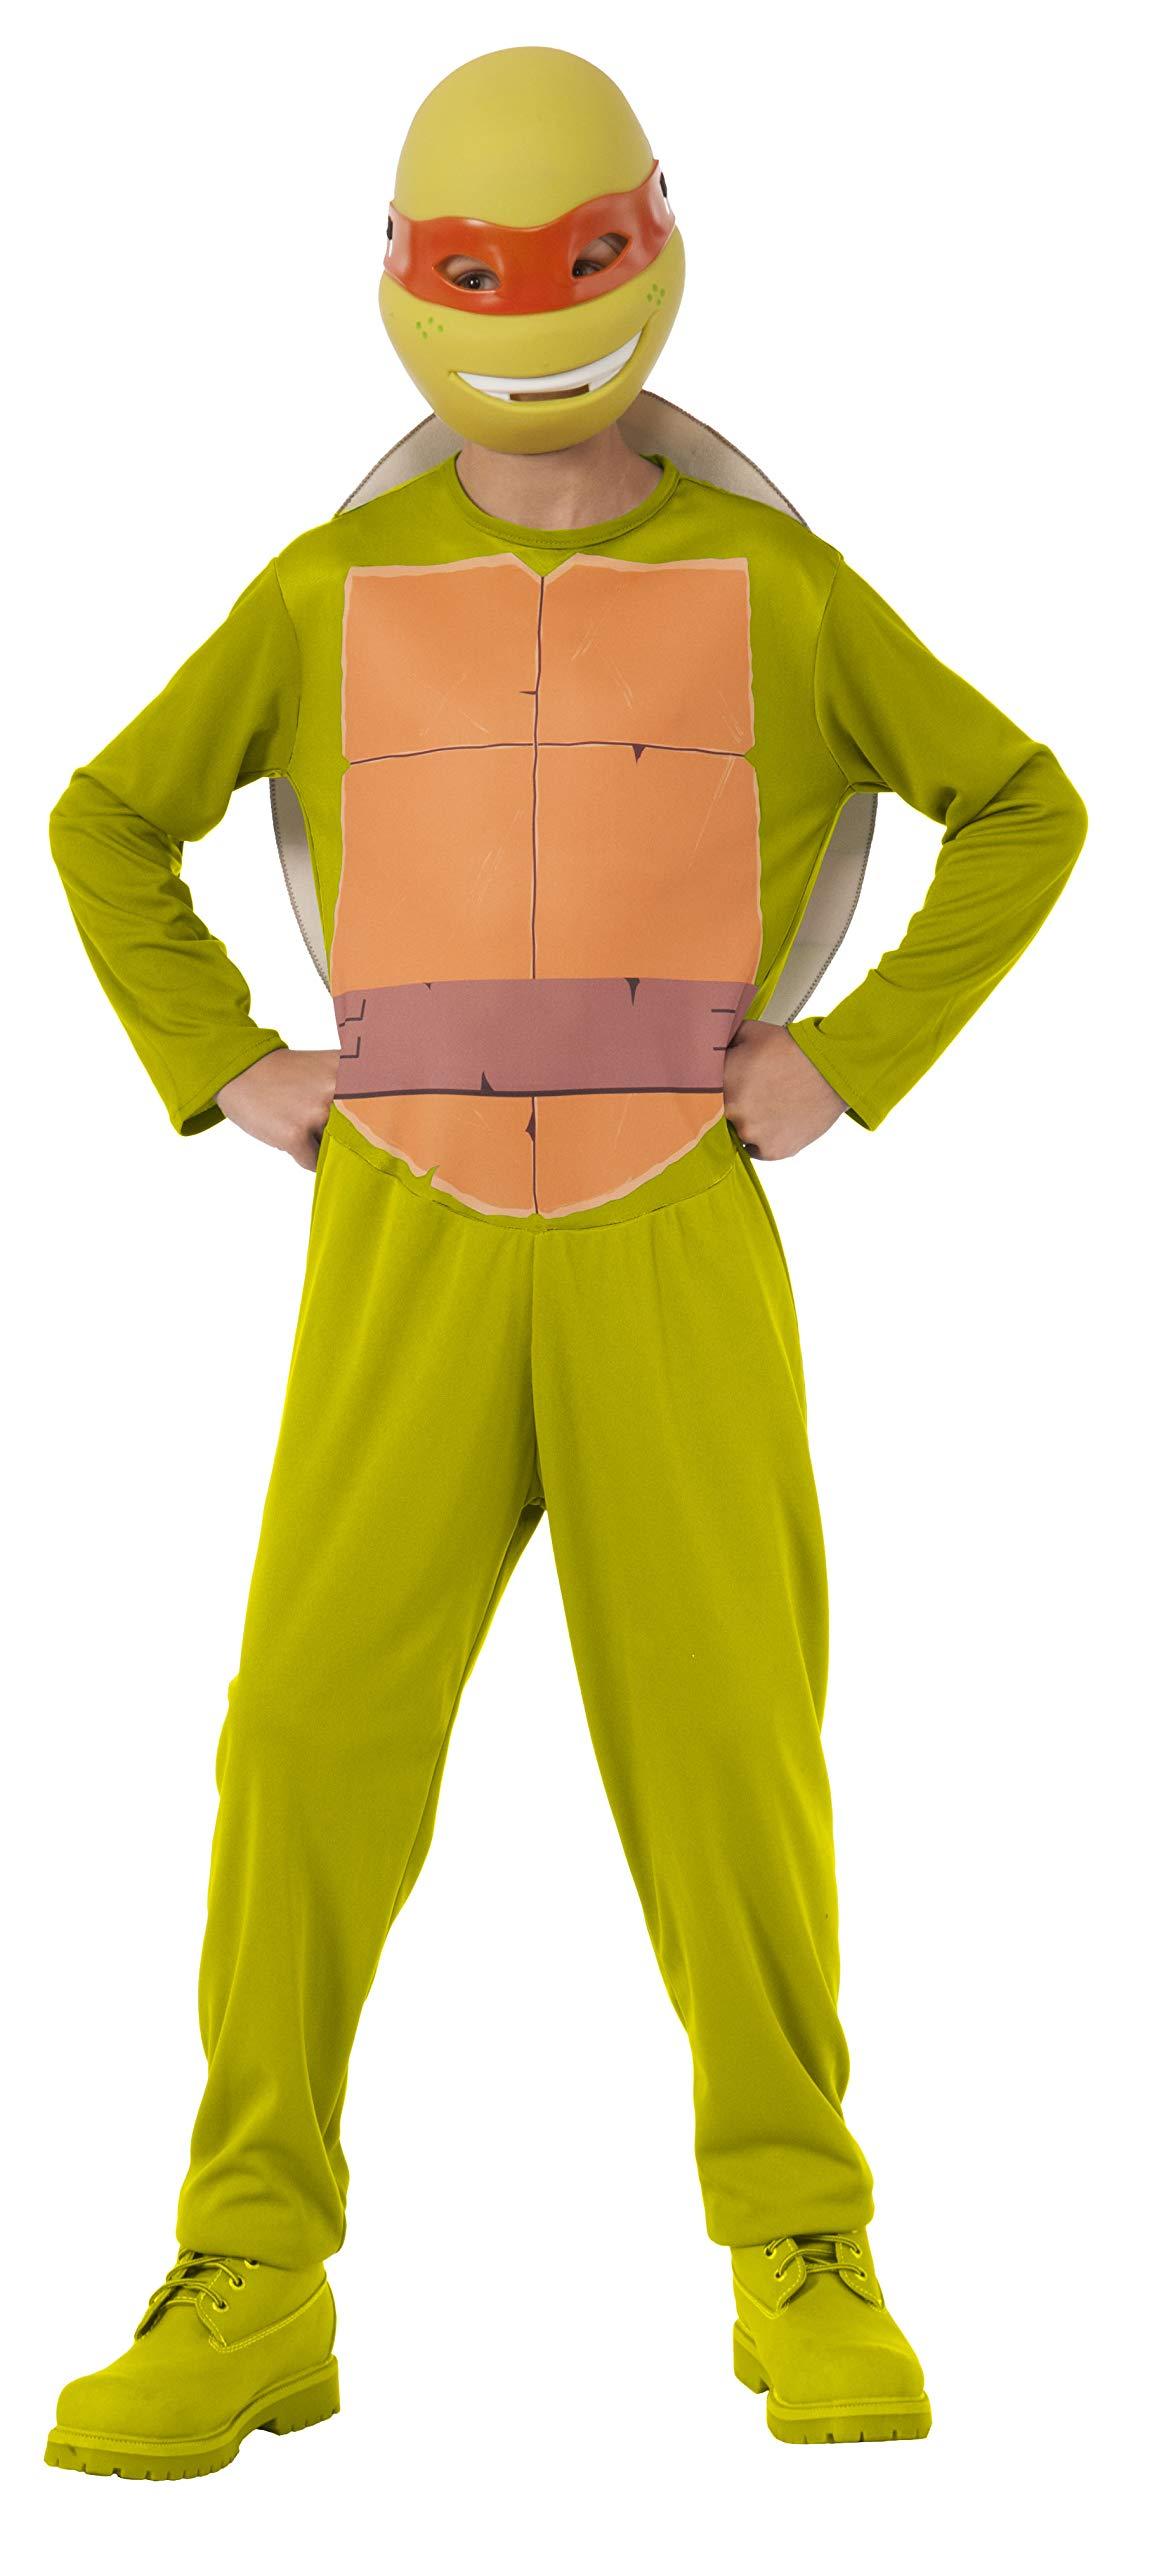 Teenage Mutant Ninja Turtles Michelangelo Action Costume Set